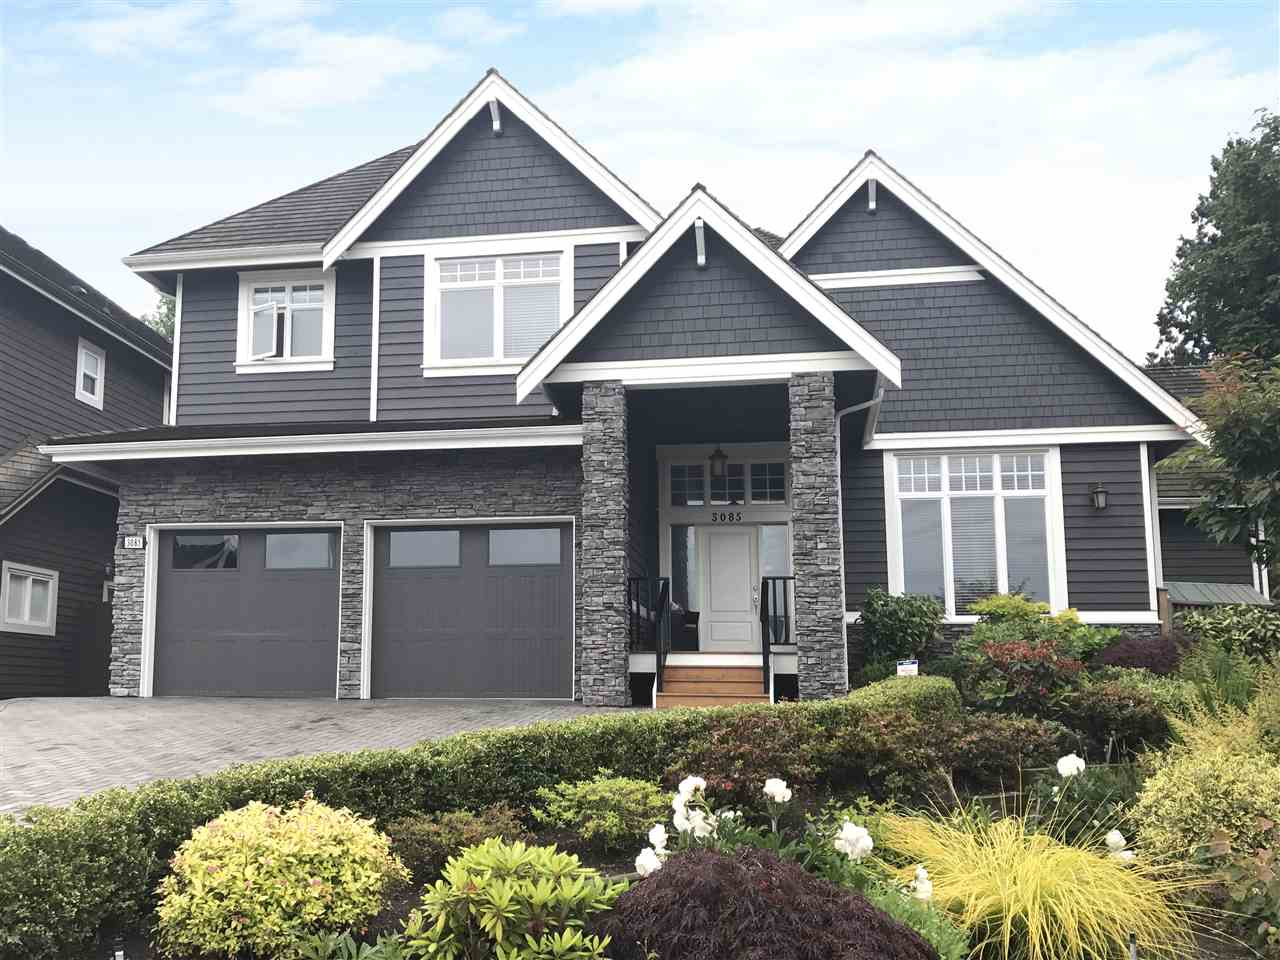 Sold: 3085 162 Street, Surrey, BC